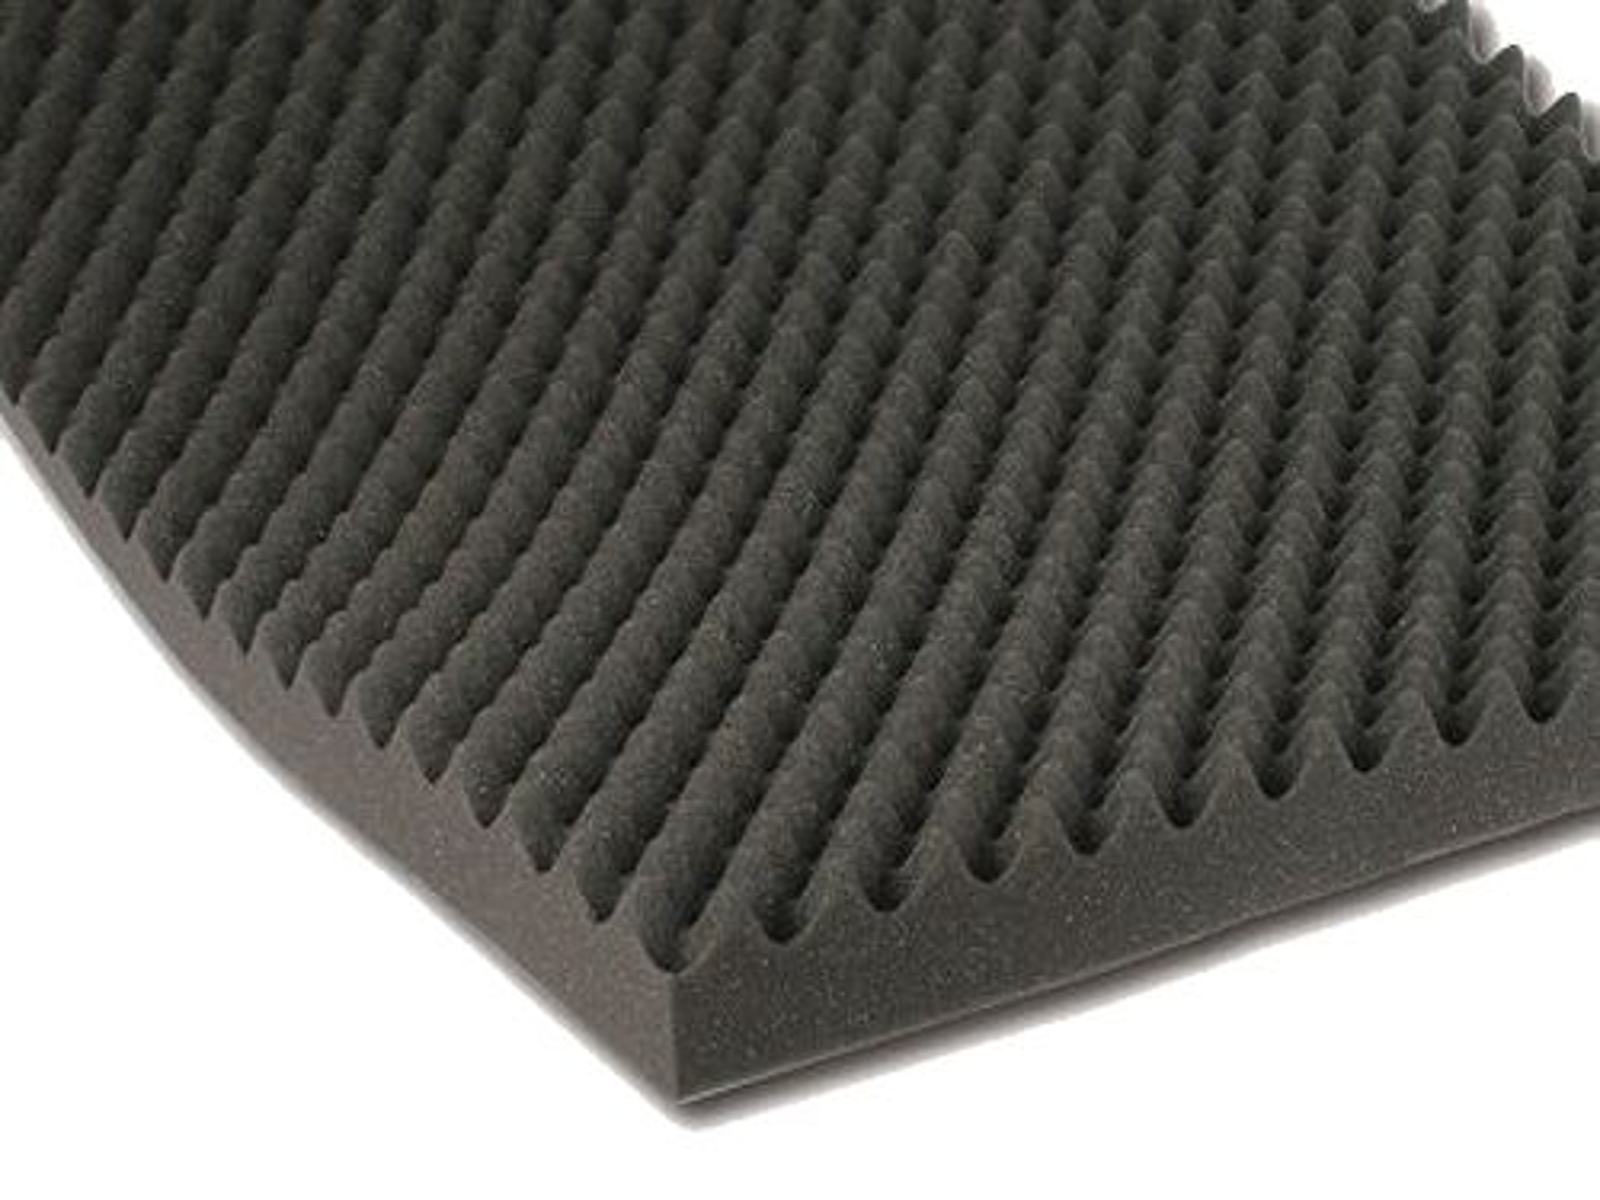 akustik noppenschaum d mmung h he 5cm farbe schwarz grau. Black Bedroom Furniture Sets. Home Design Ideas